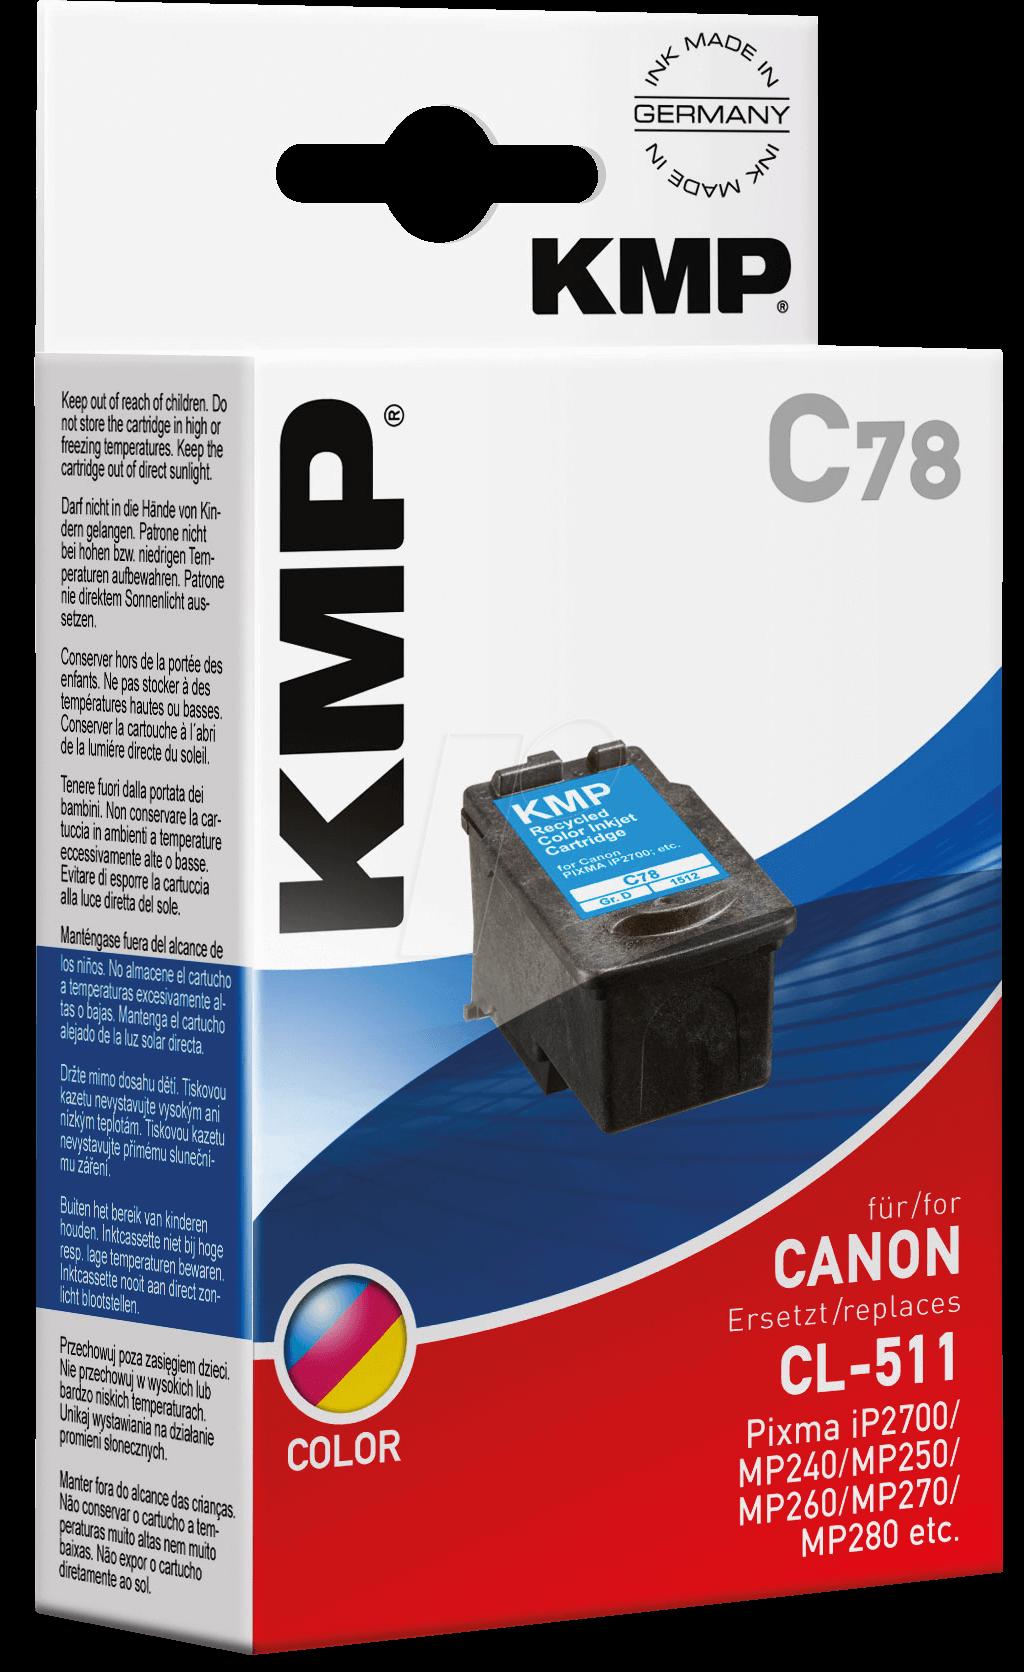 KMP 1512,4030 - Tinte - Canon - 3-farbig - CL-511 - refill